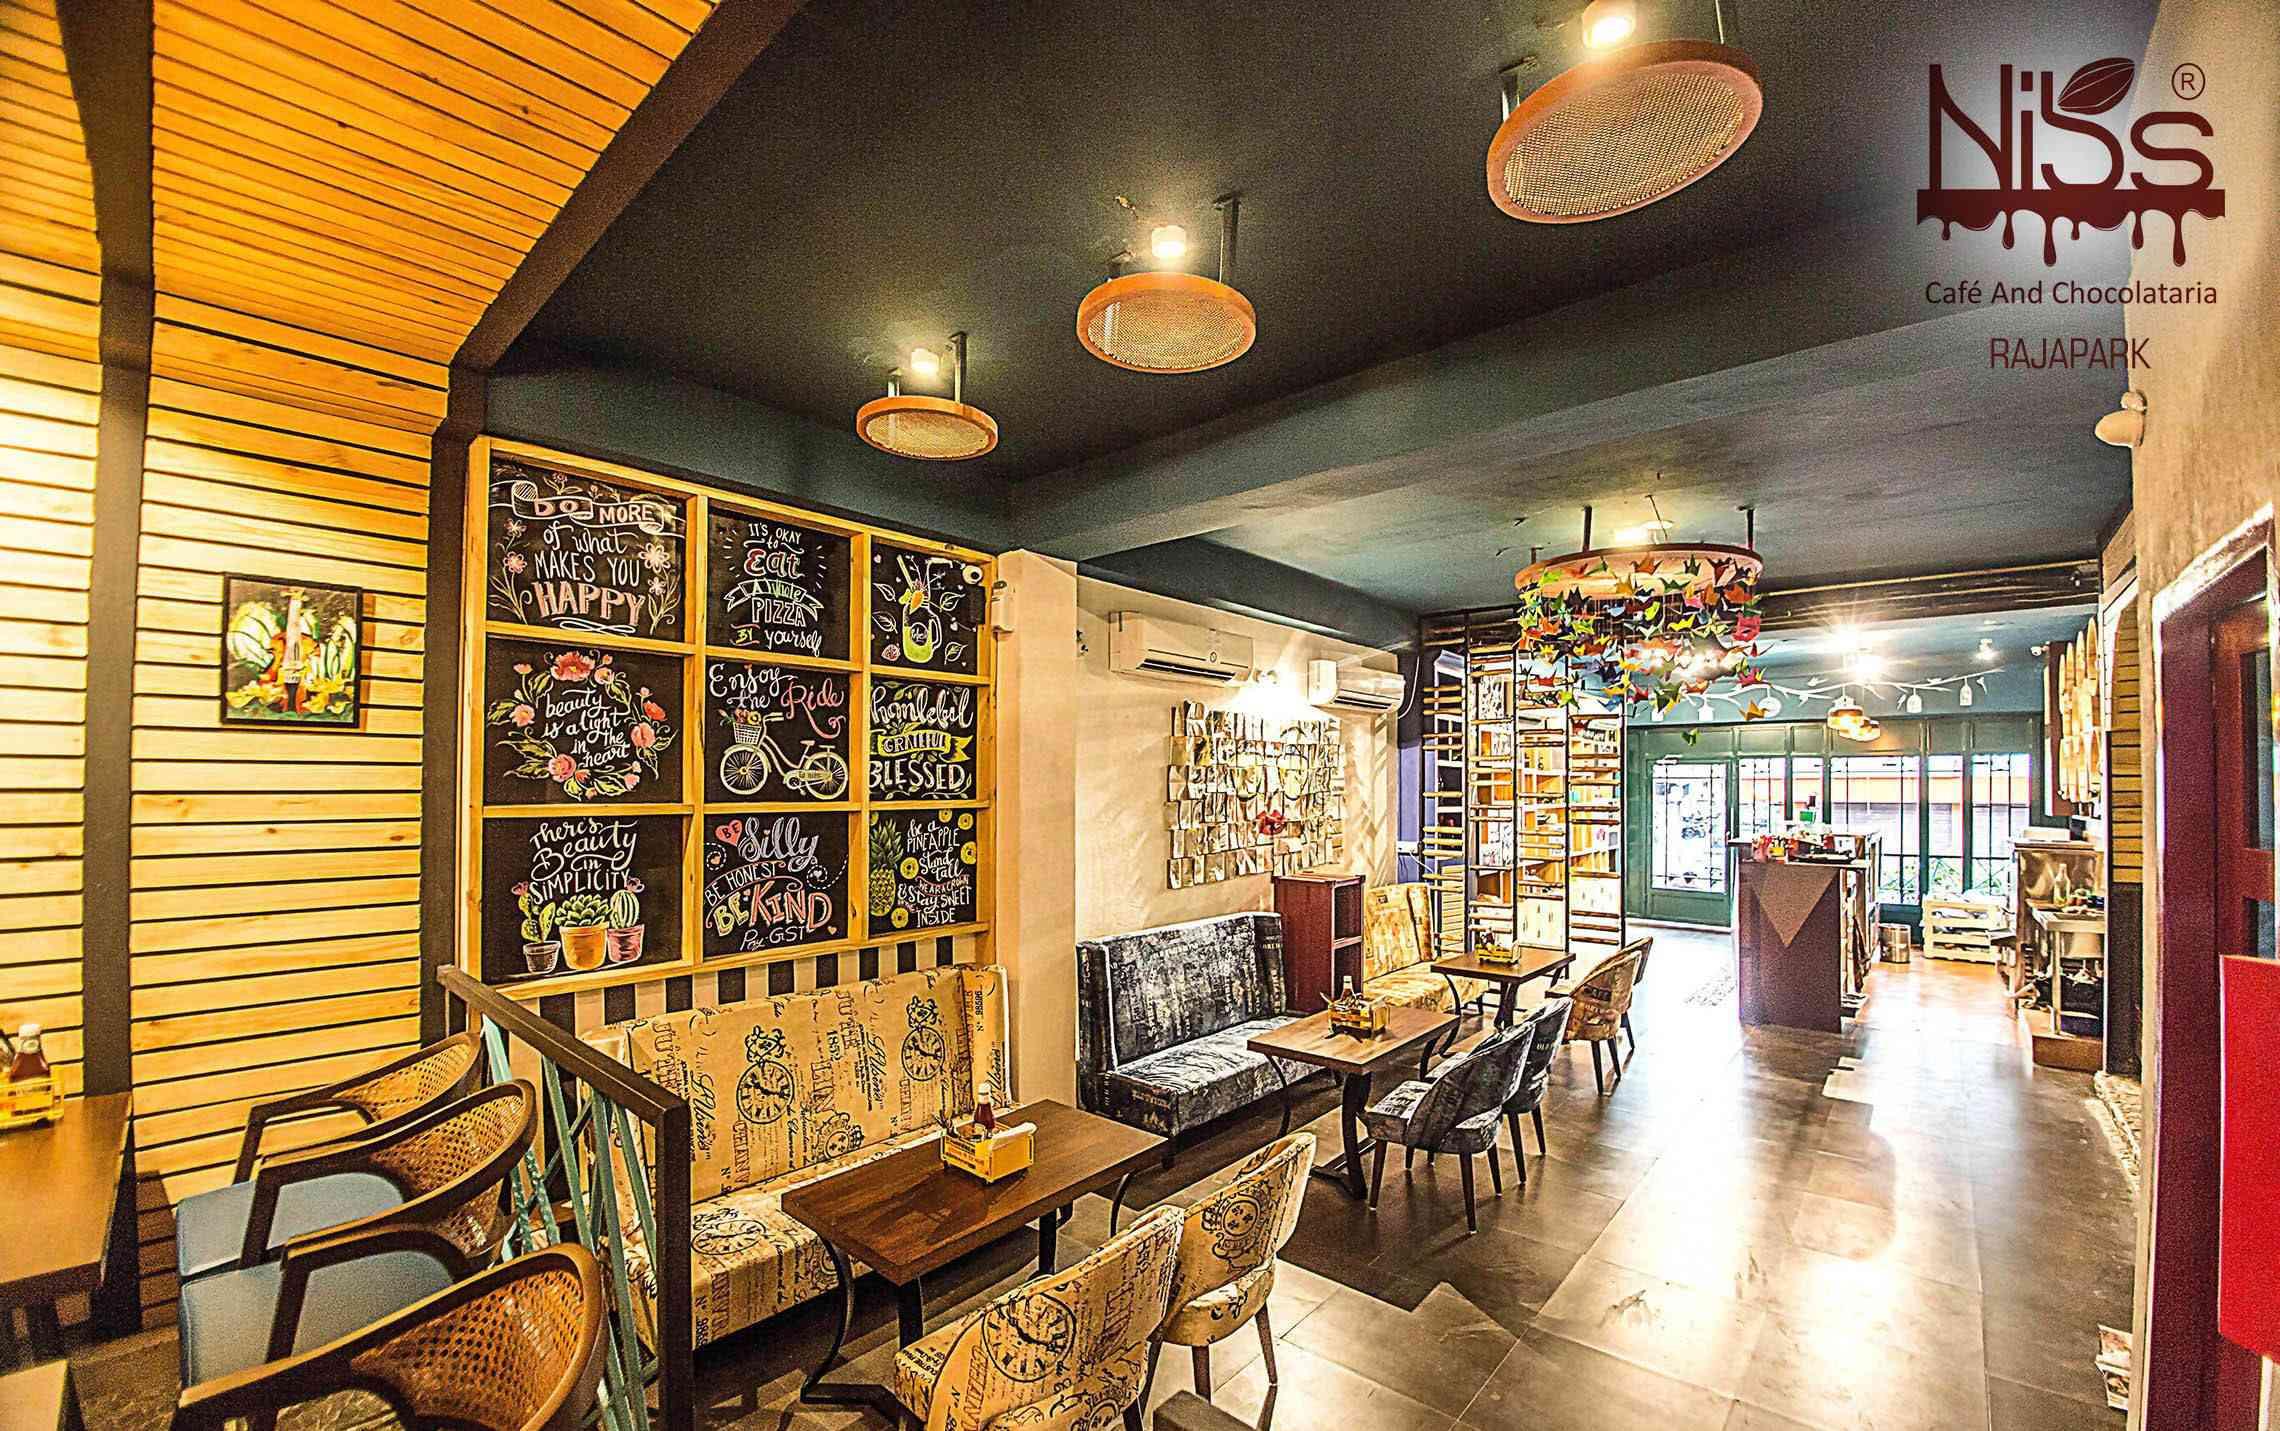 NIBS Café and Chocolataria